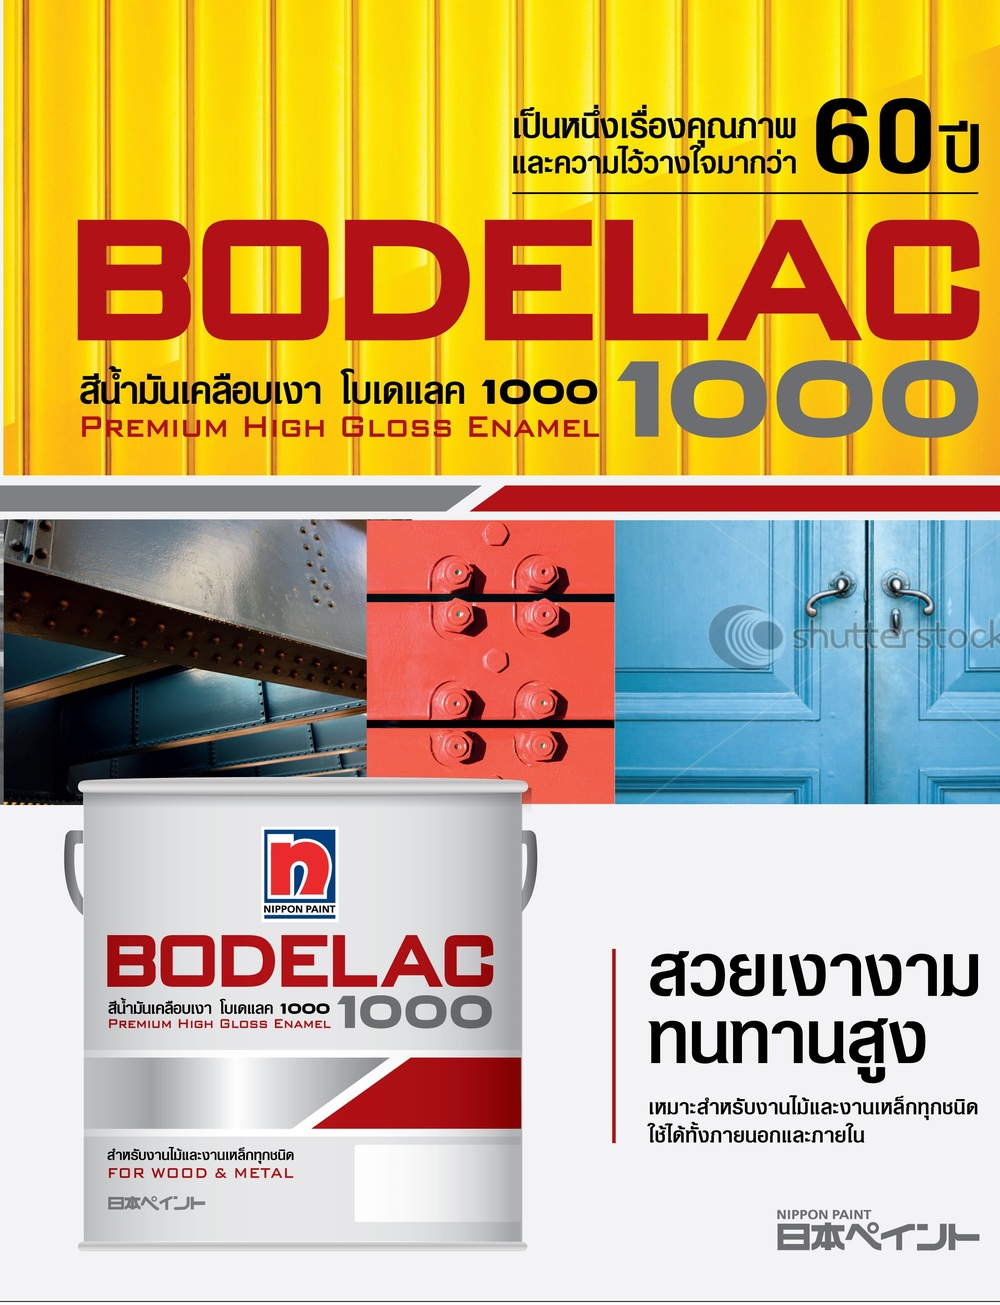 Bodelac 1000